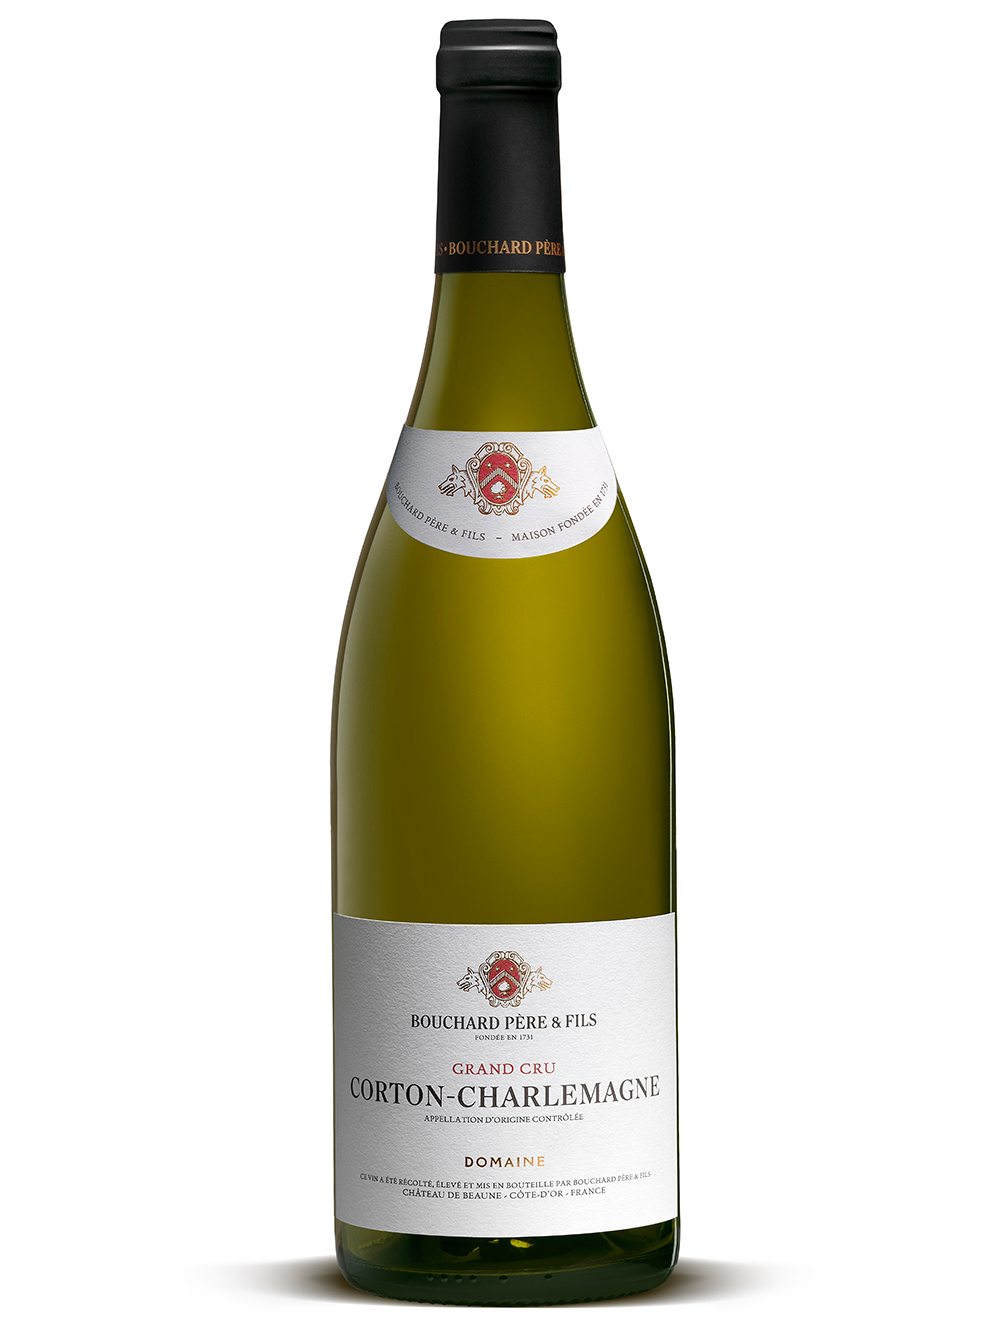 Corton-Charlemagne Grand Cru